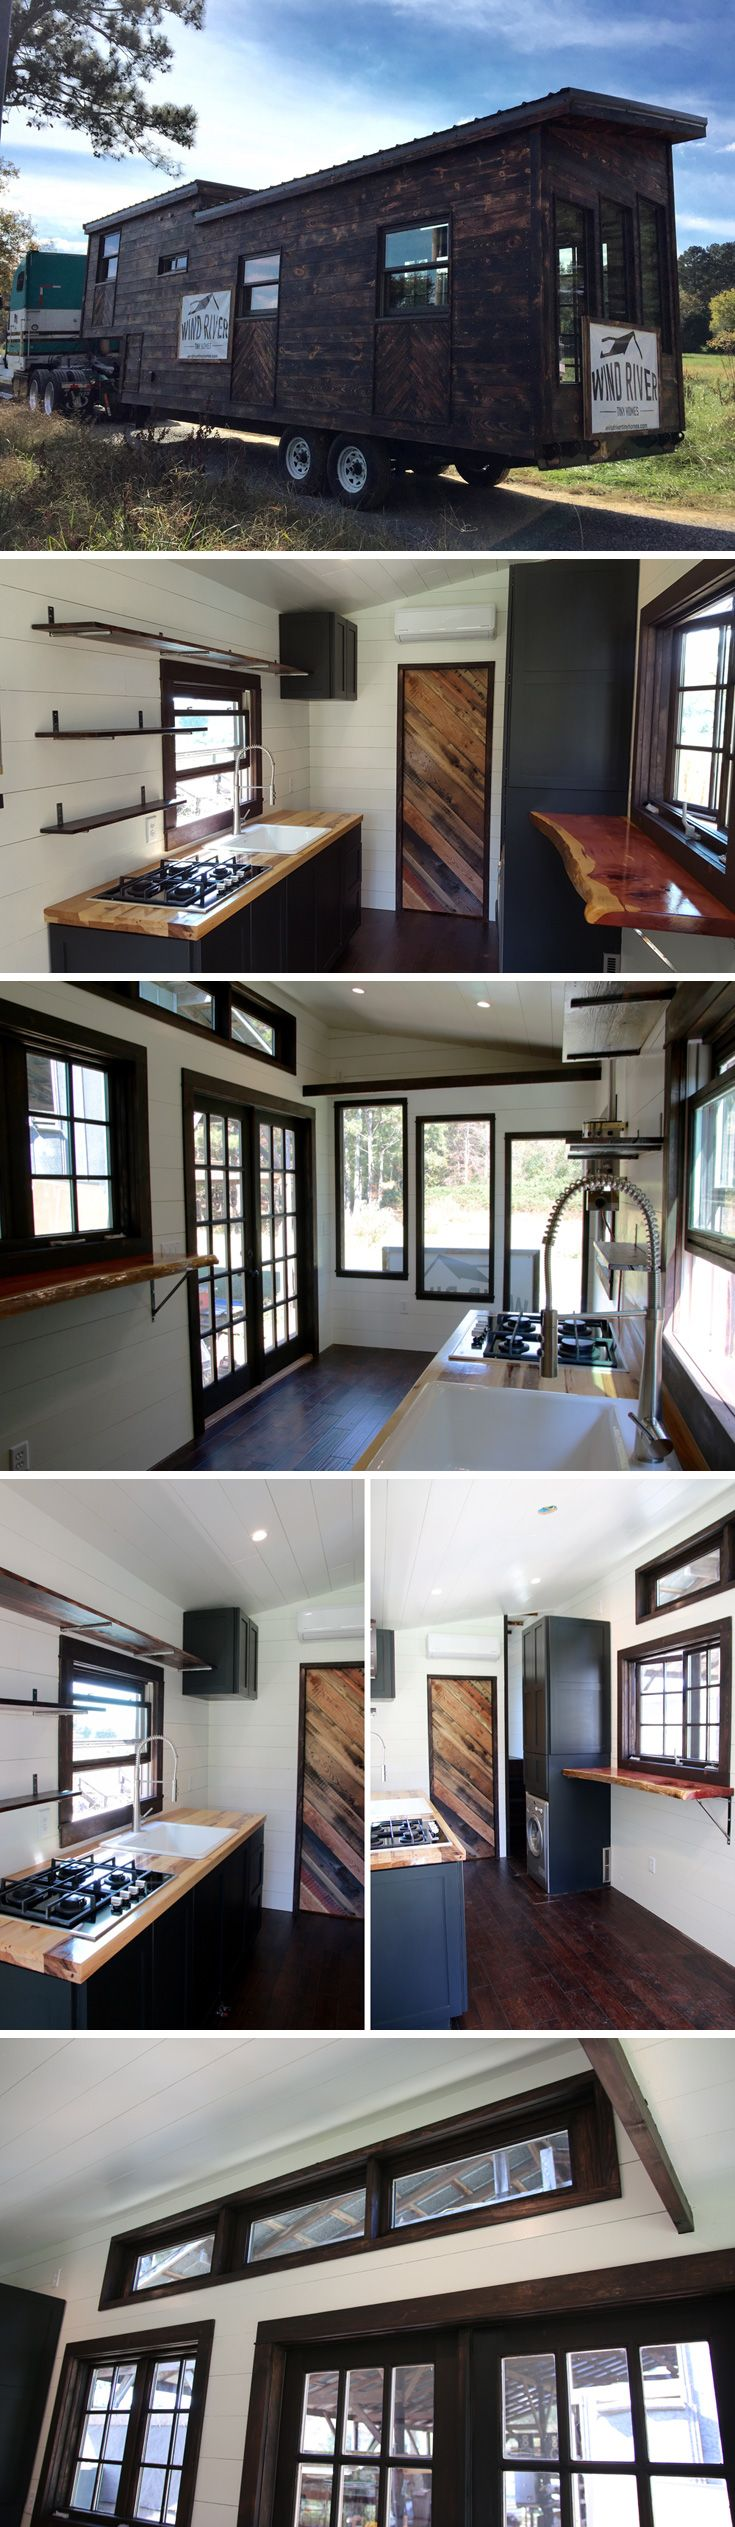 Small homes interior - A Gooseneck Tiny House With A Shou Sugi Ban Cedar Exterior The Interior Continues The